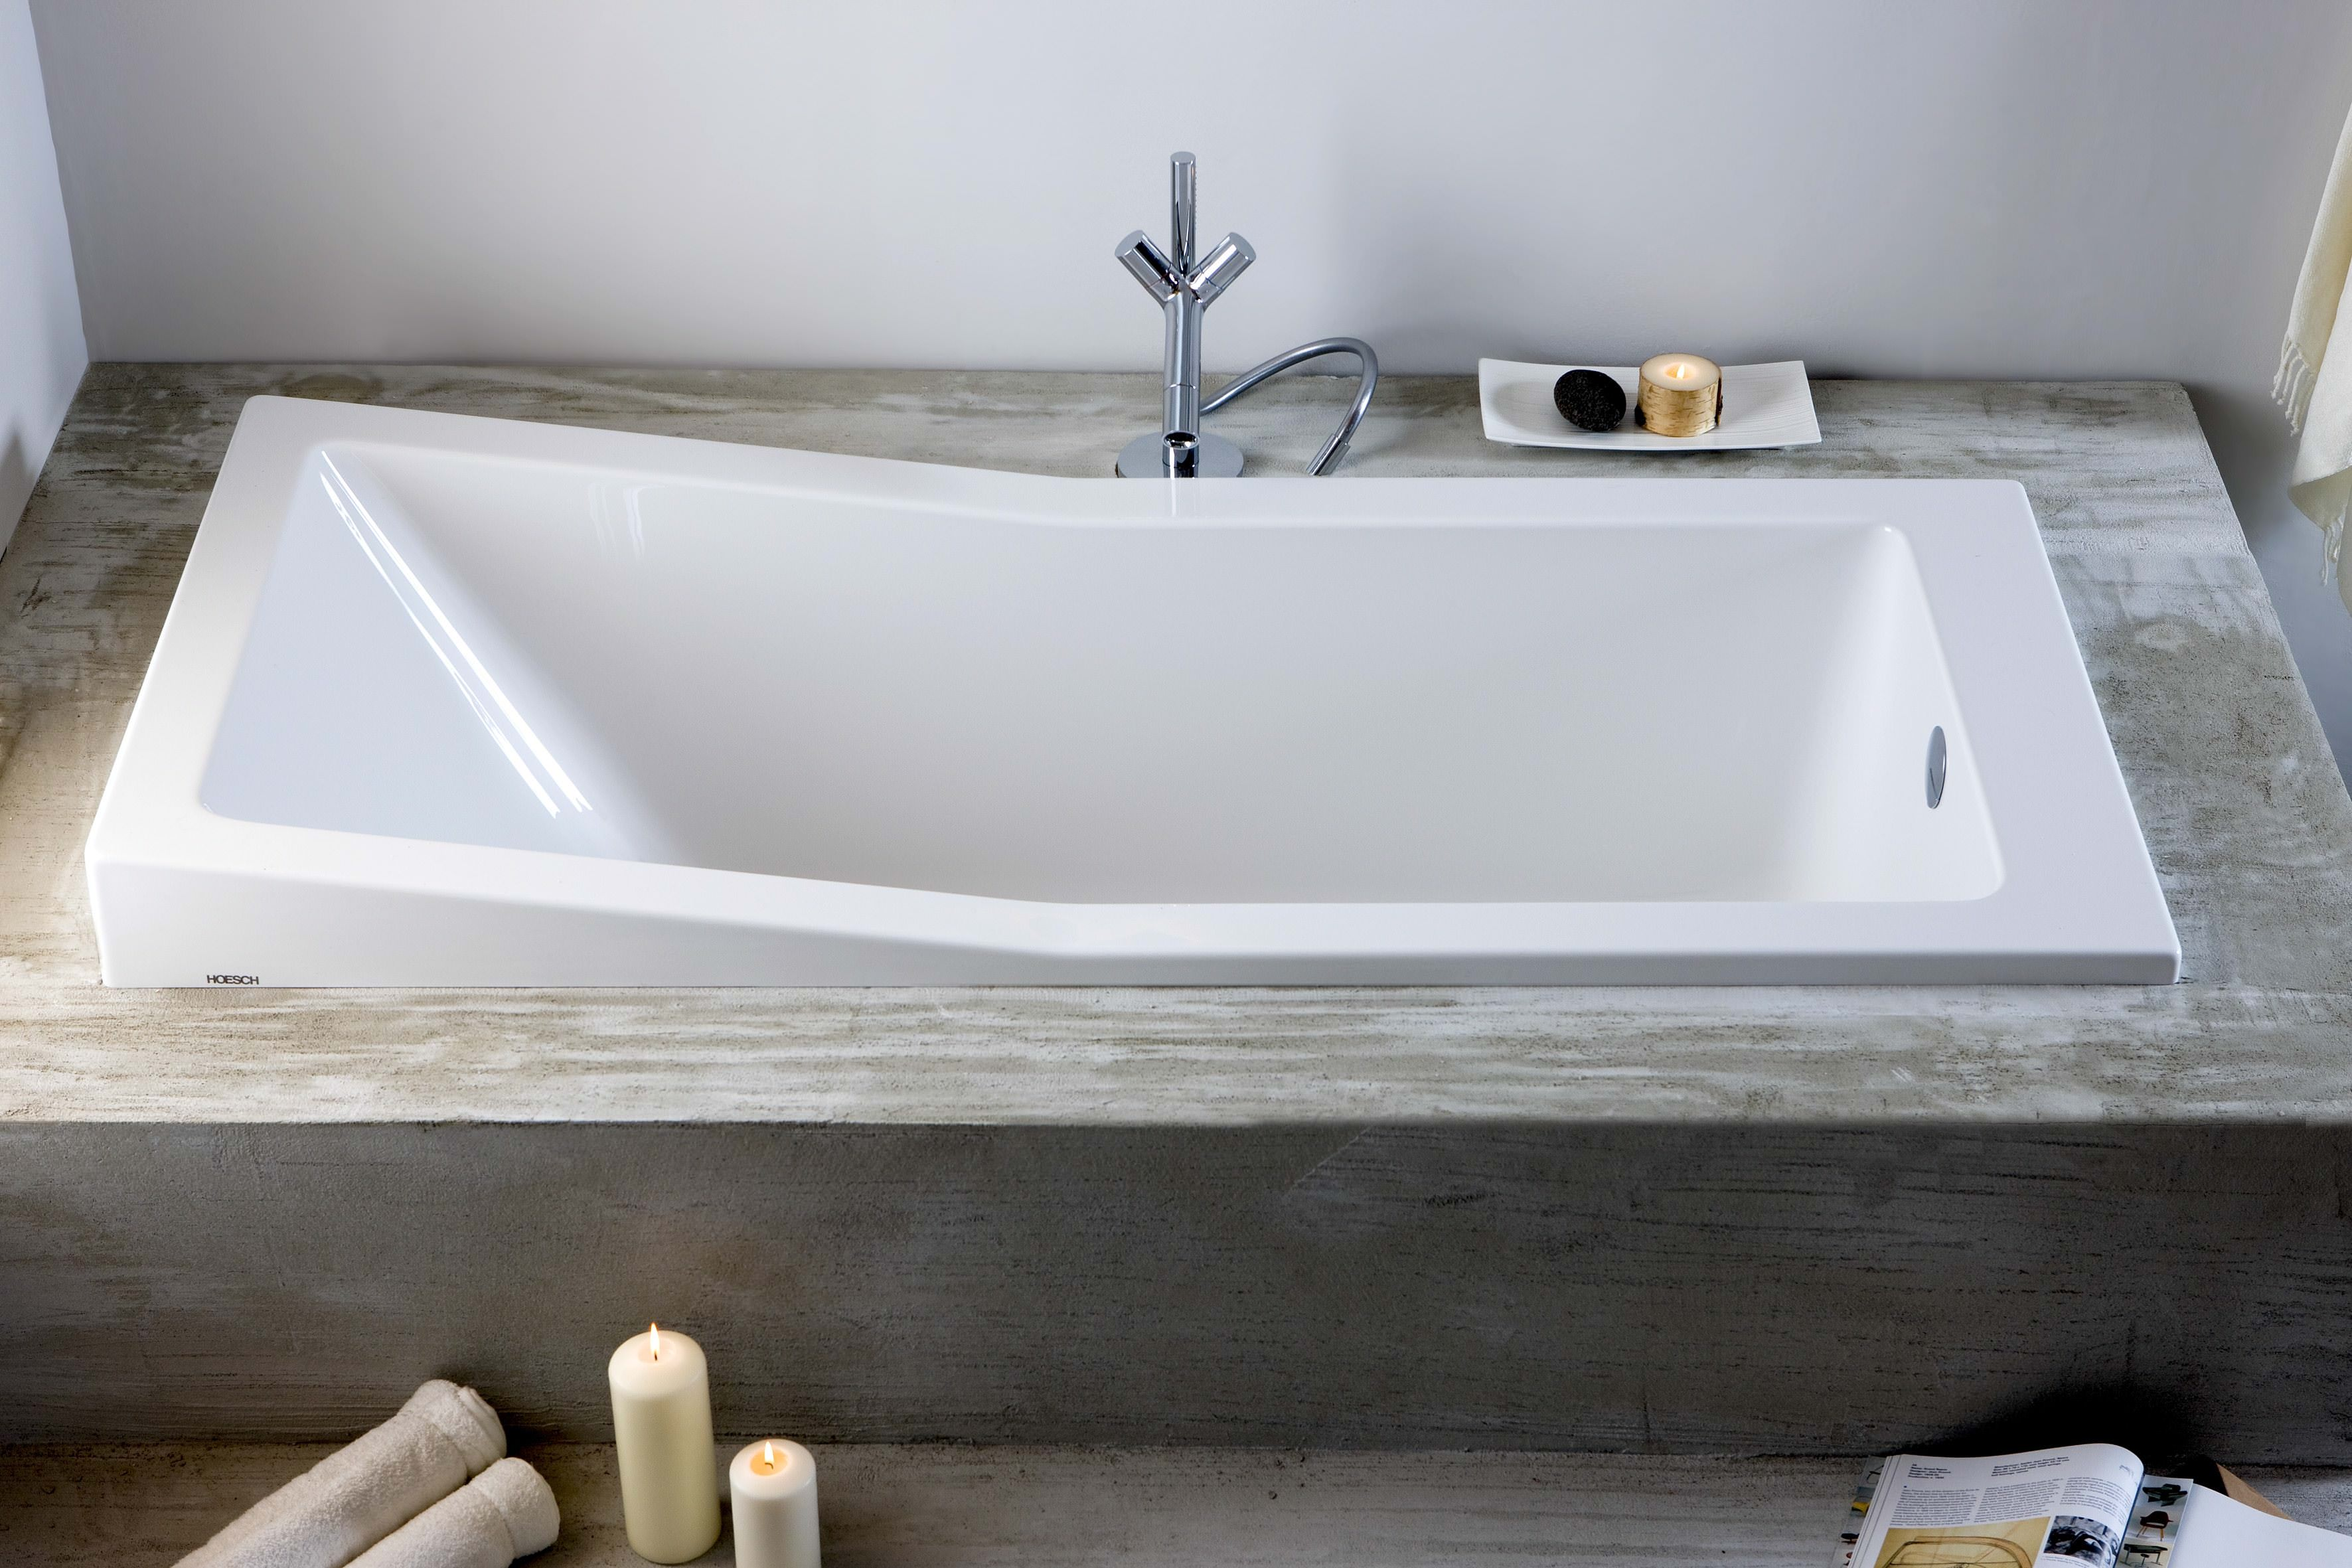 hoesch foster rechteckbadewanne 1700 x 700 mm einsitzer wei. Black Bedroom Furniture Sets. Home Design Ideas